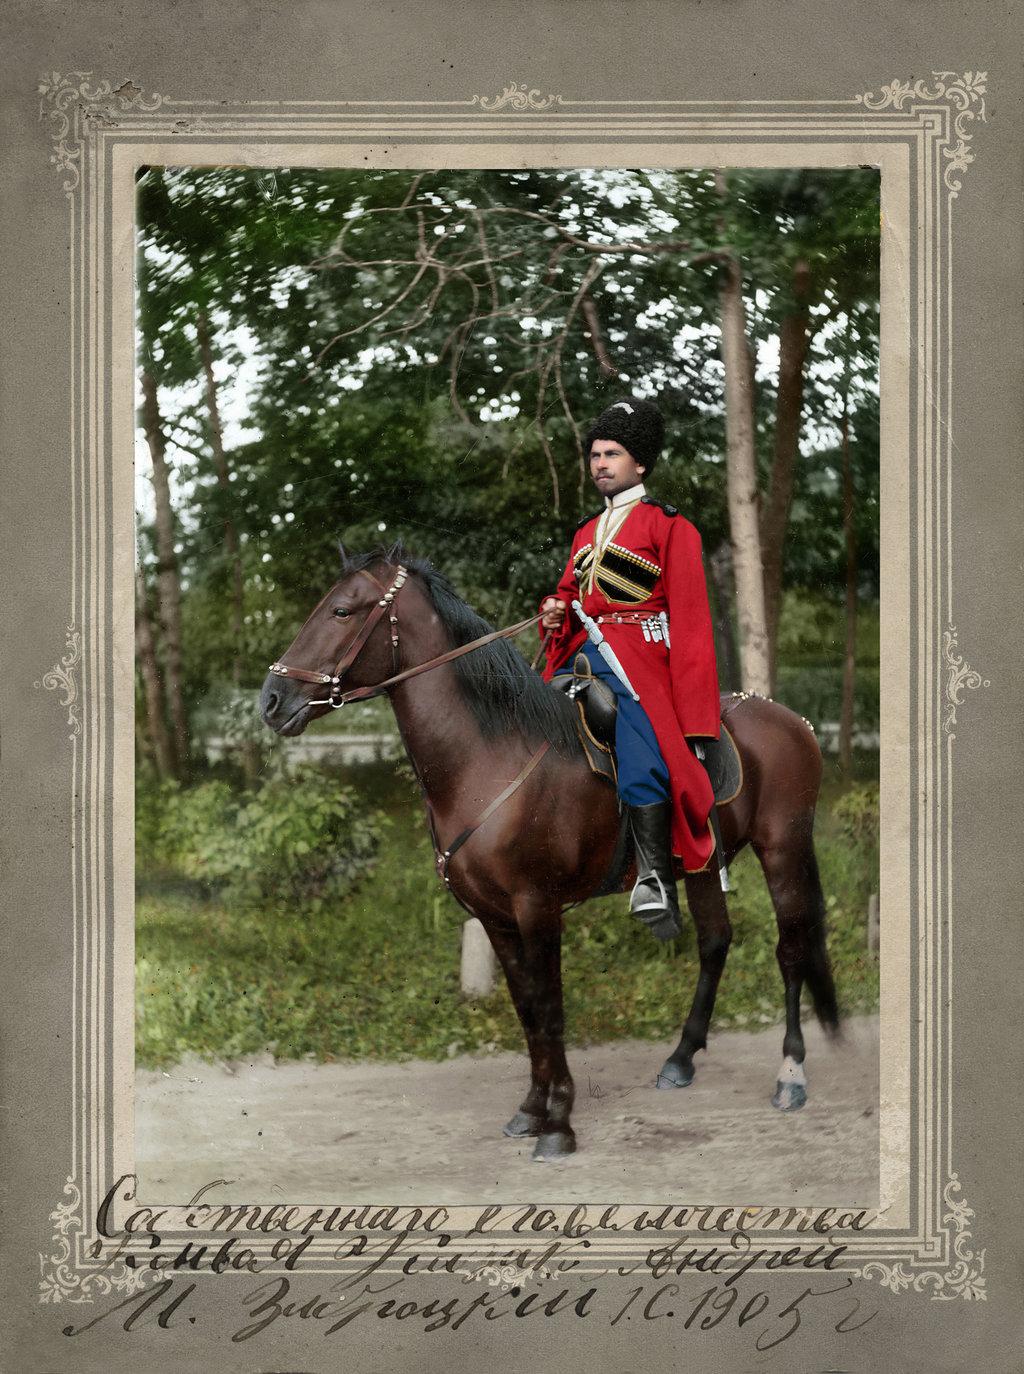 andrey_zabrodsky__cossack__1905_by_klimbims-daxv4lr.jpg